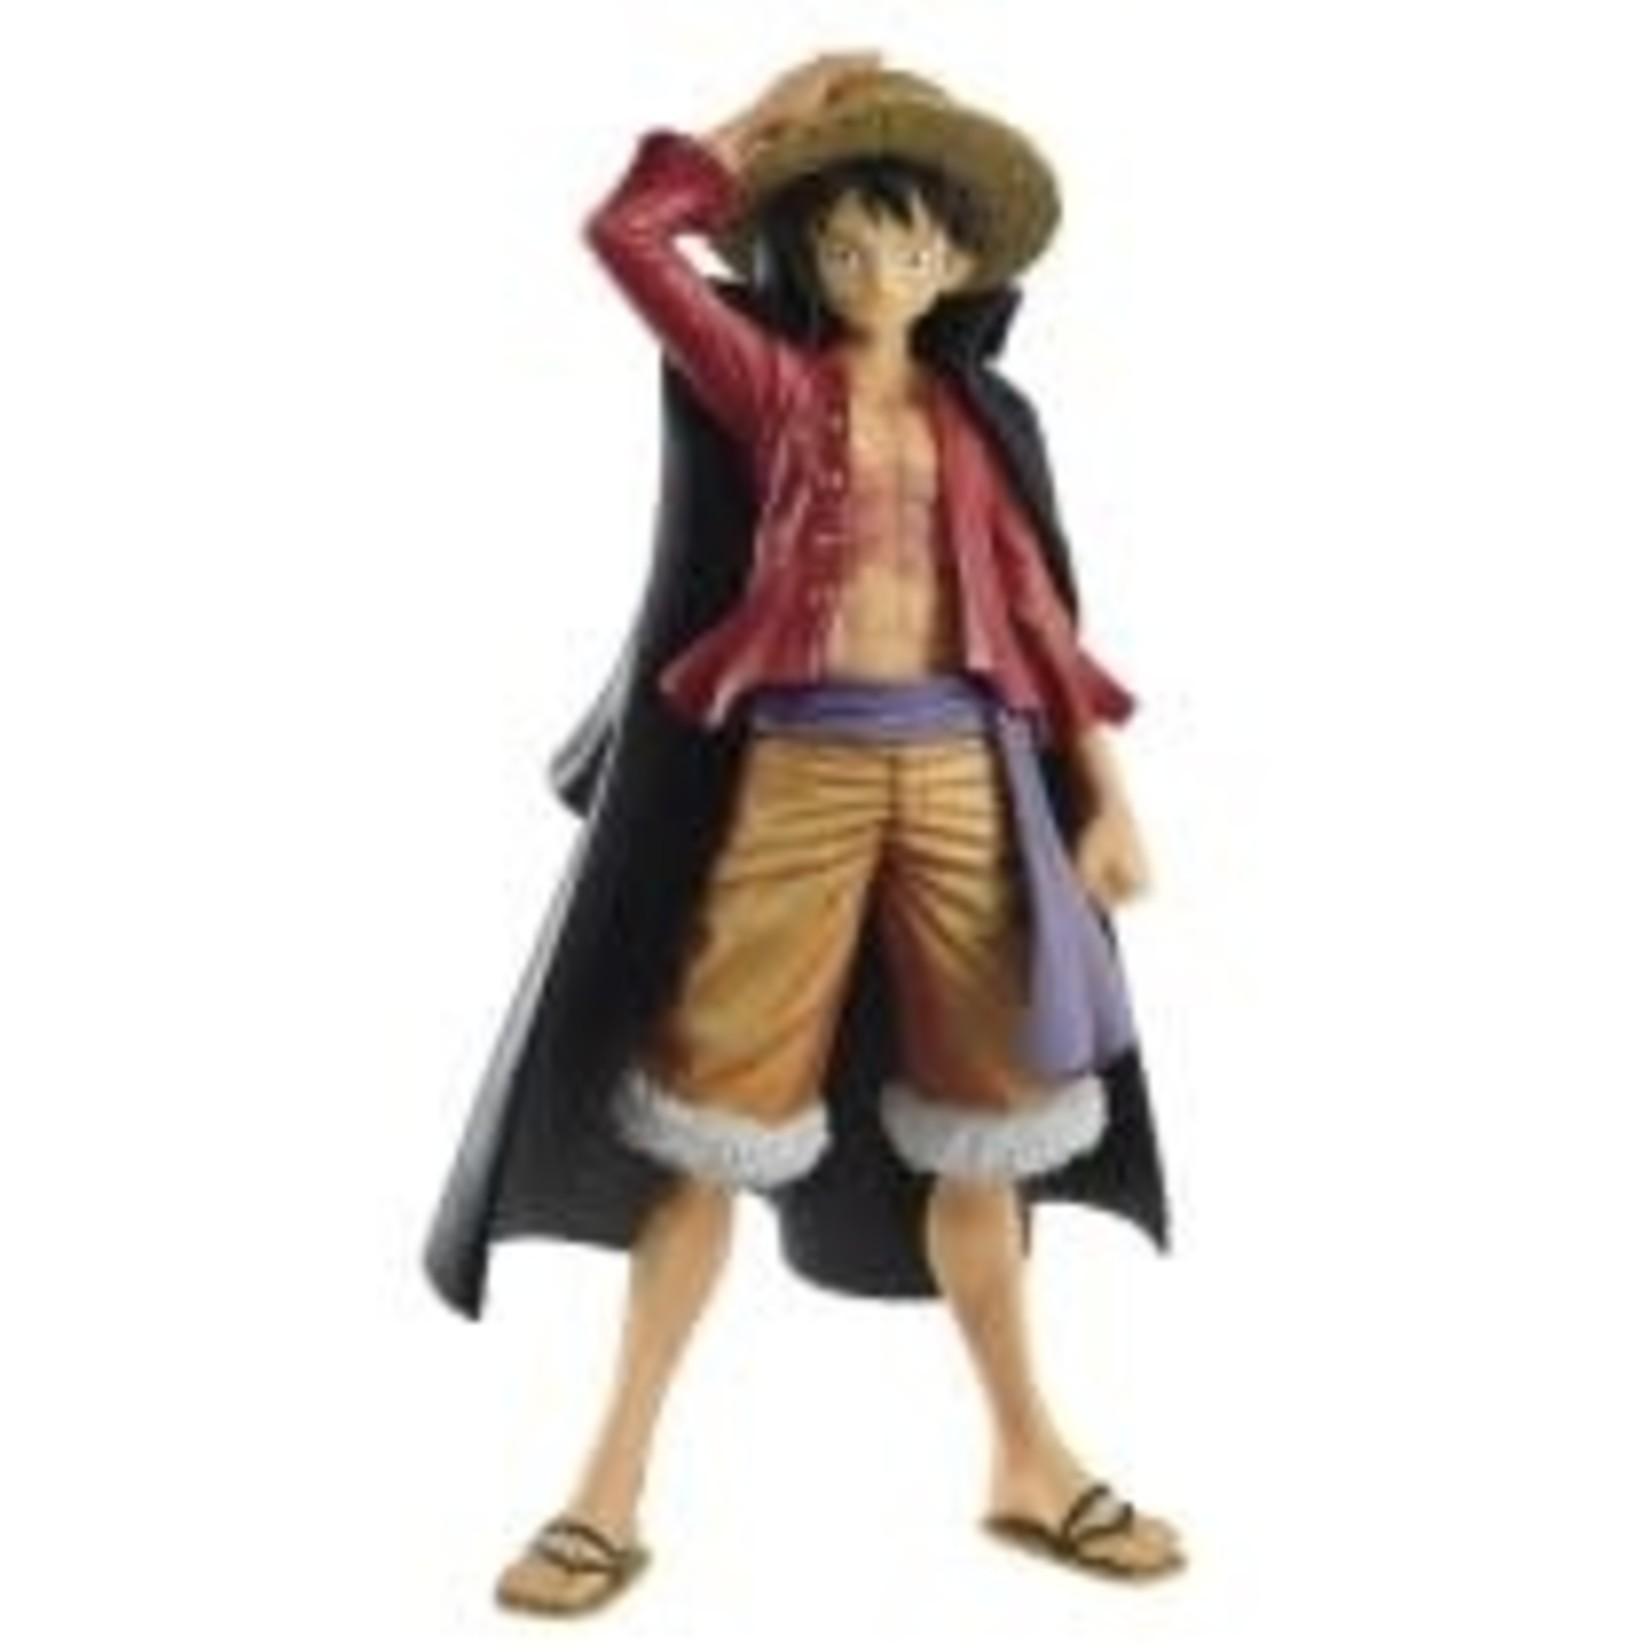 FIGURE-One Piece The Grandline Men Monky D Luffy Vol. 11